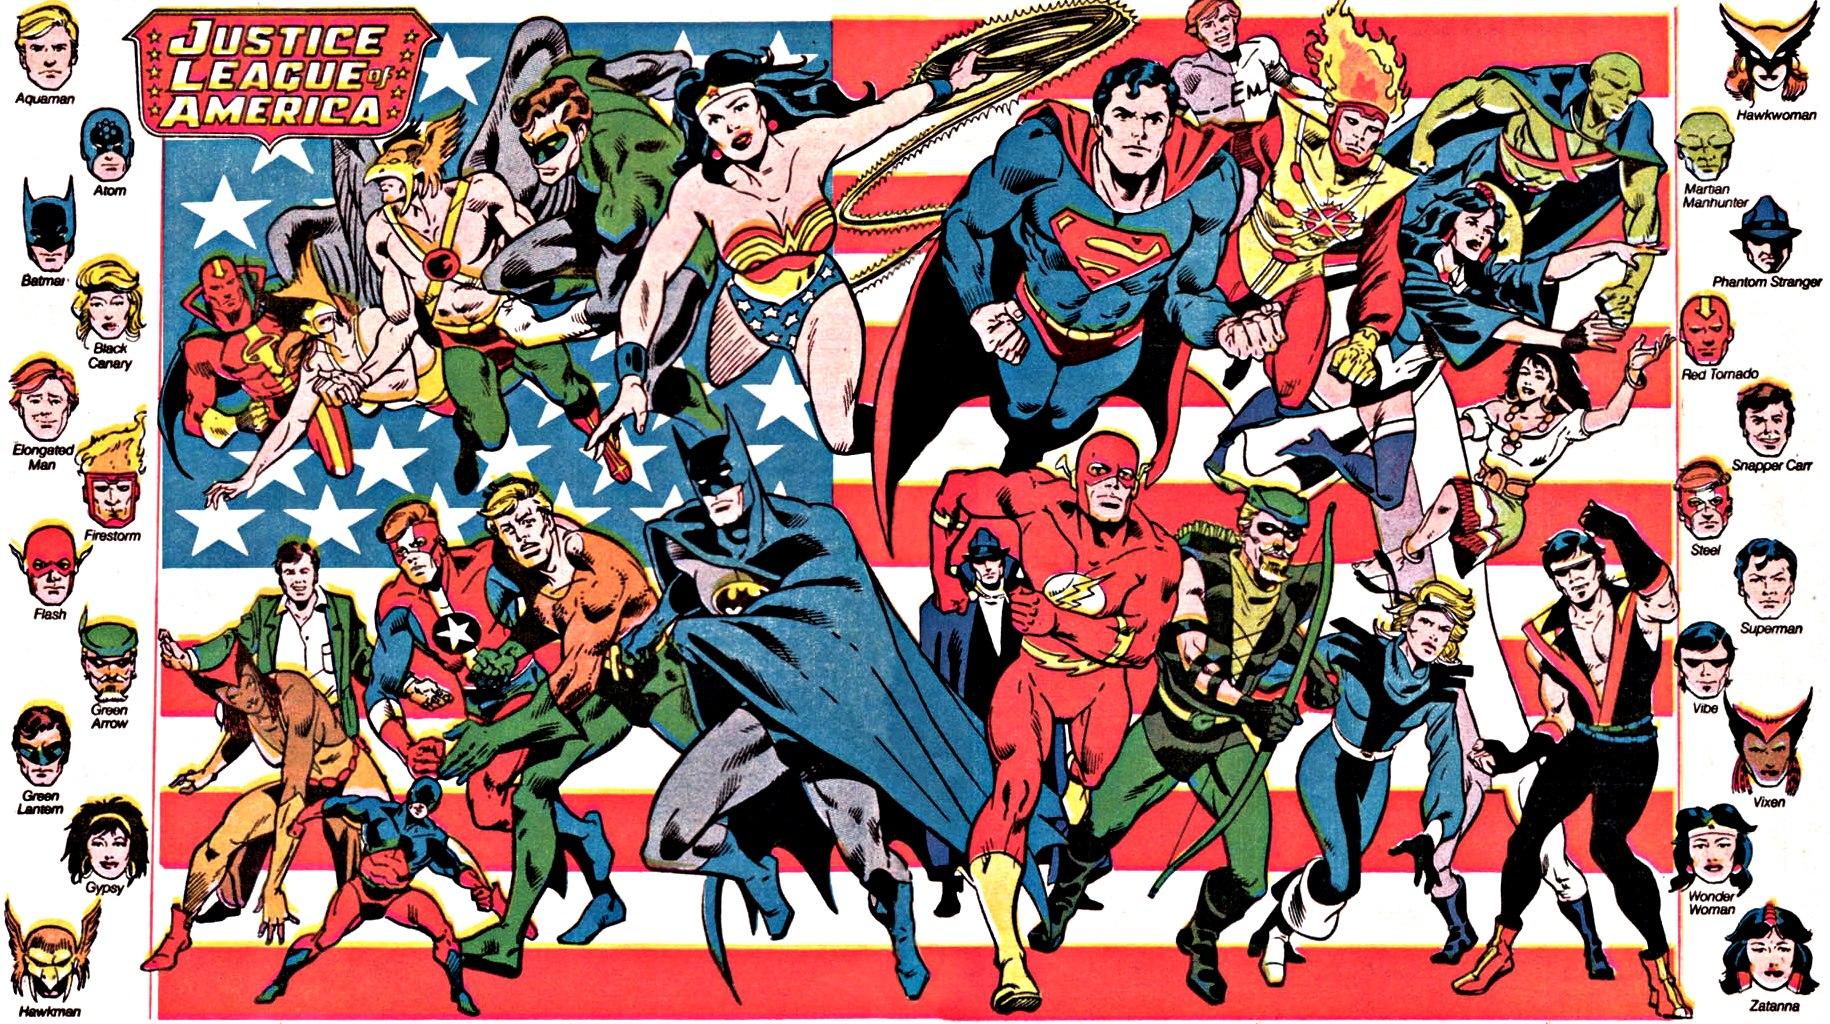 Justice League Justice Leage 7 Wallpaper Wallpaper Justice